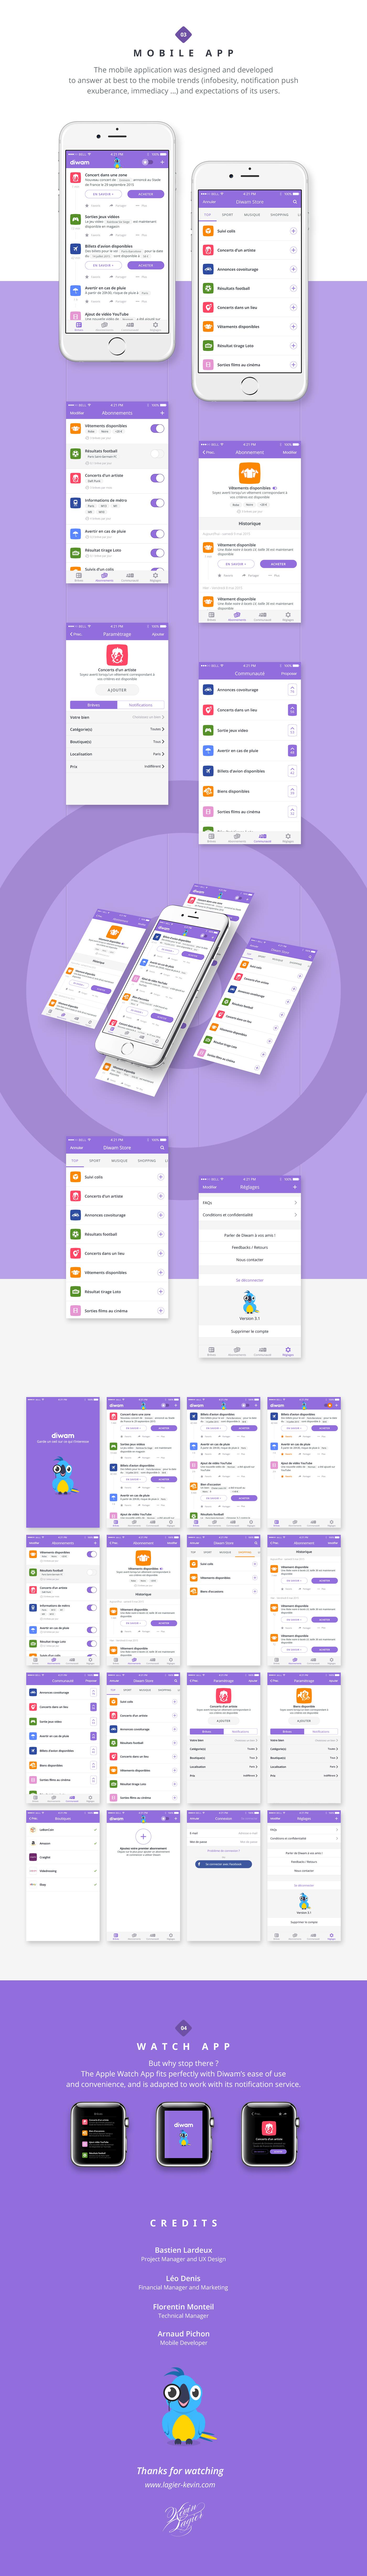 Diwam app mobile service Mascot parrot personalized UI ux